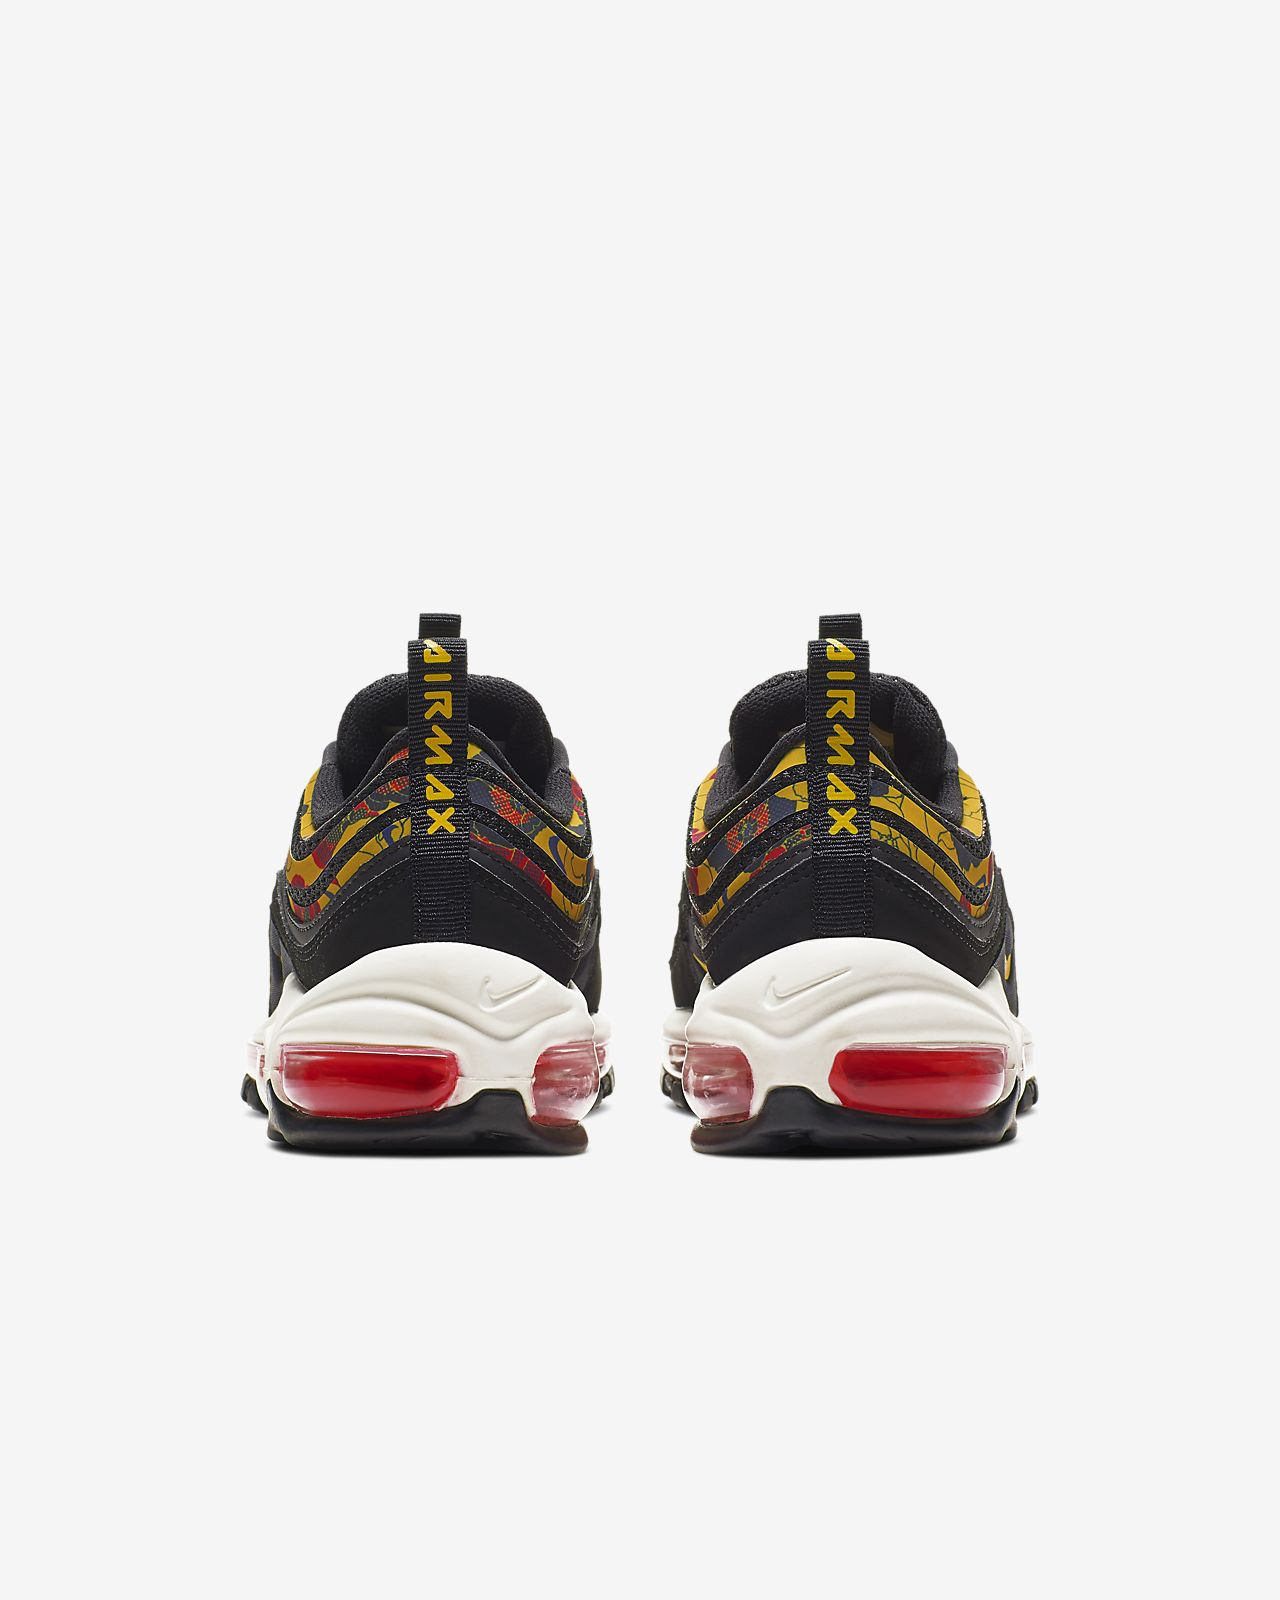 BV0129 001 Nike Wmns Air Max 97 SE Floral BlackUniversity